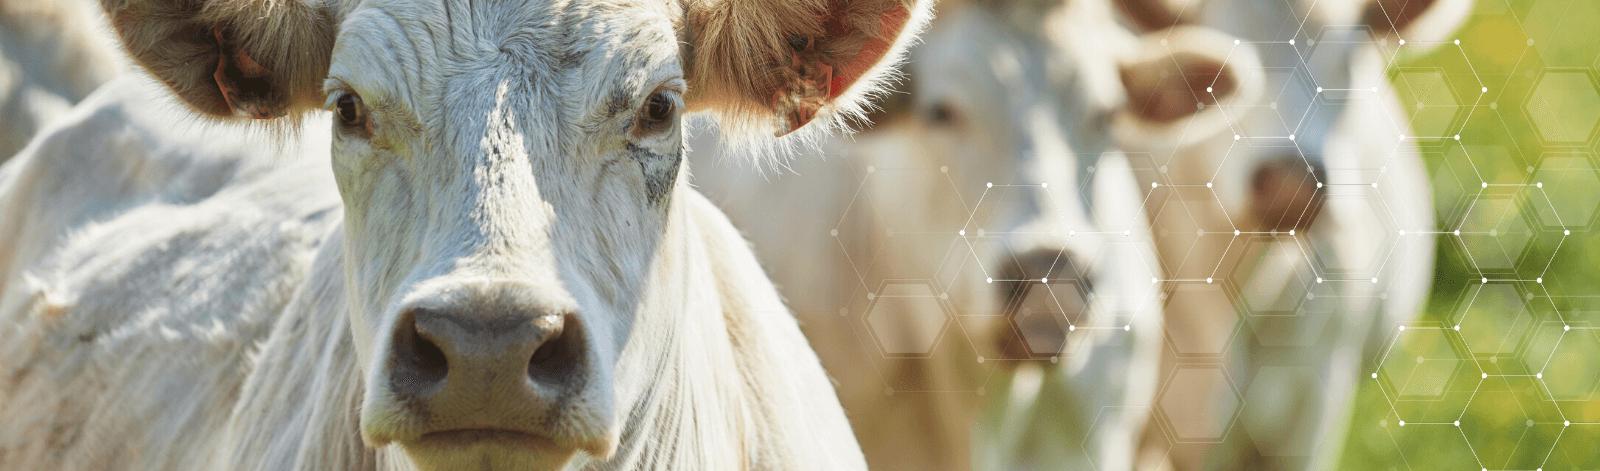 Charolais beef cattle